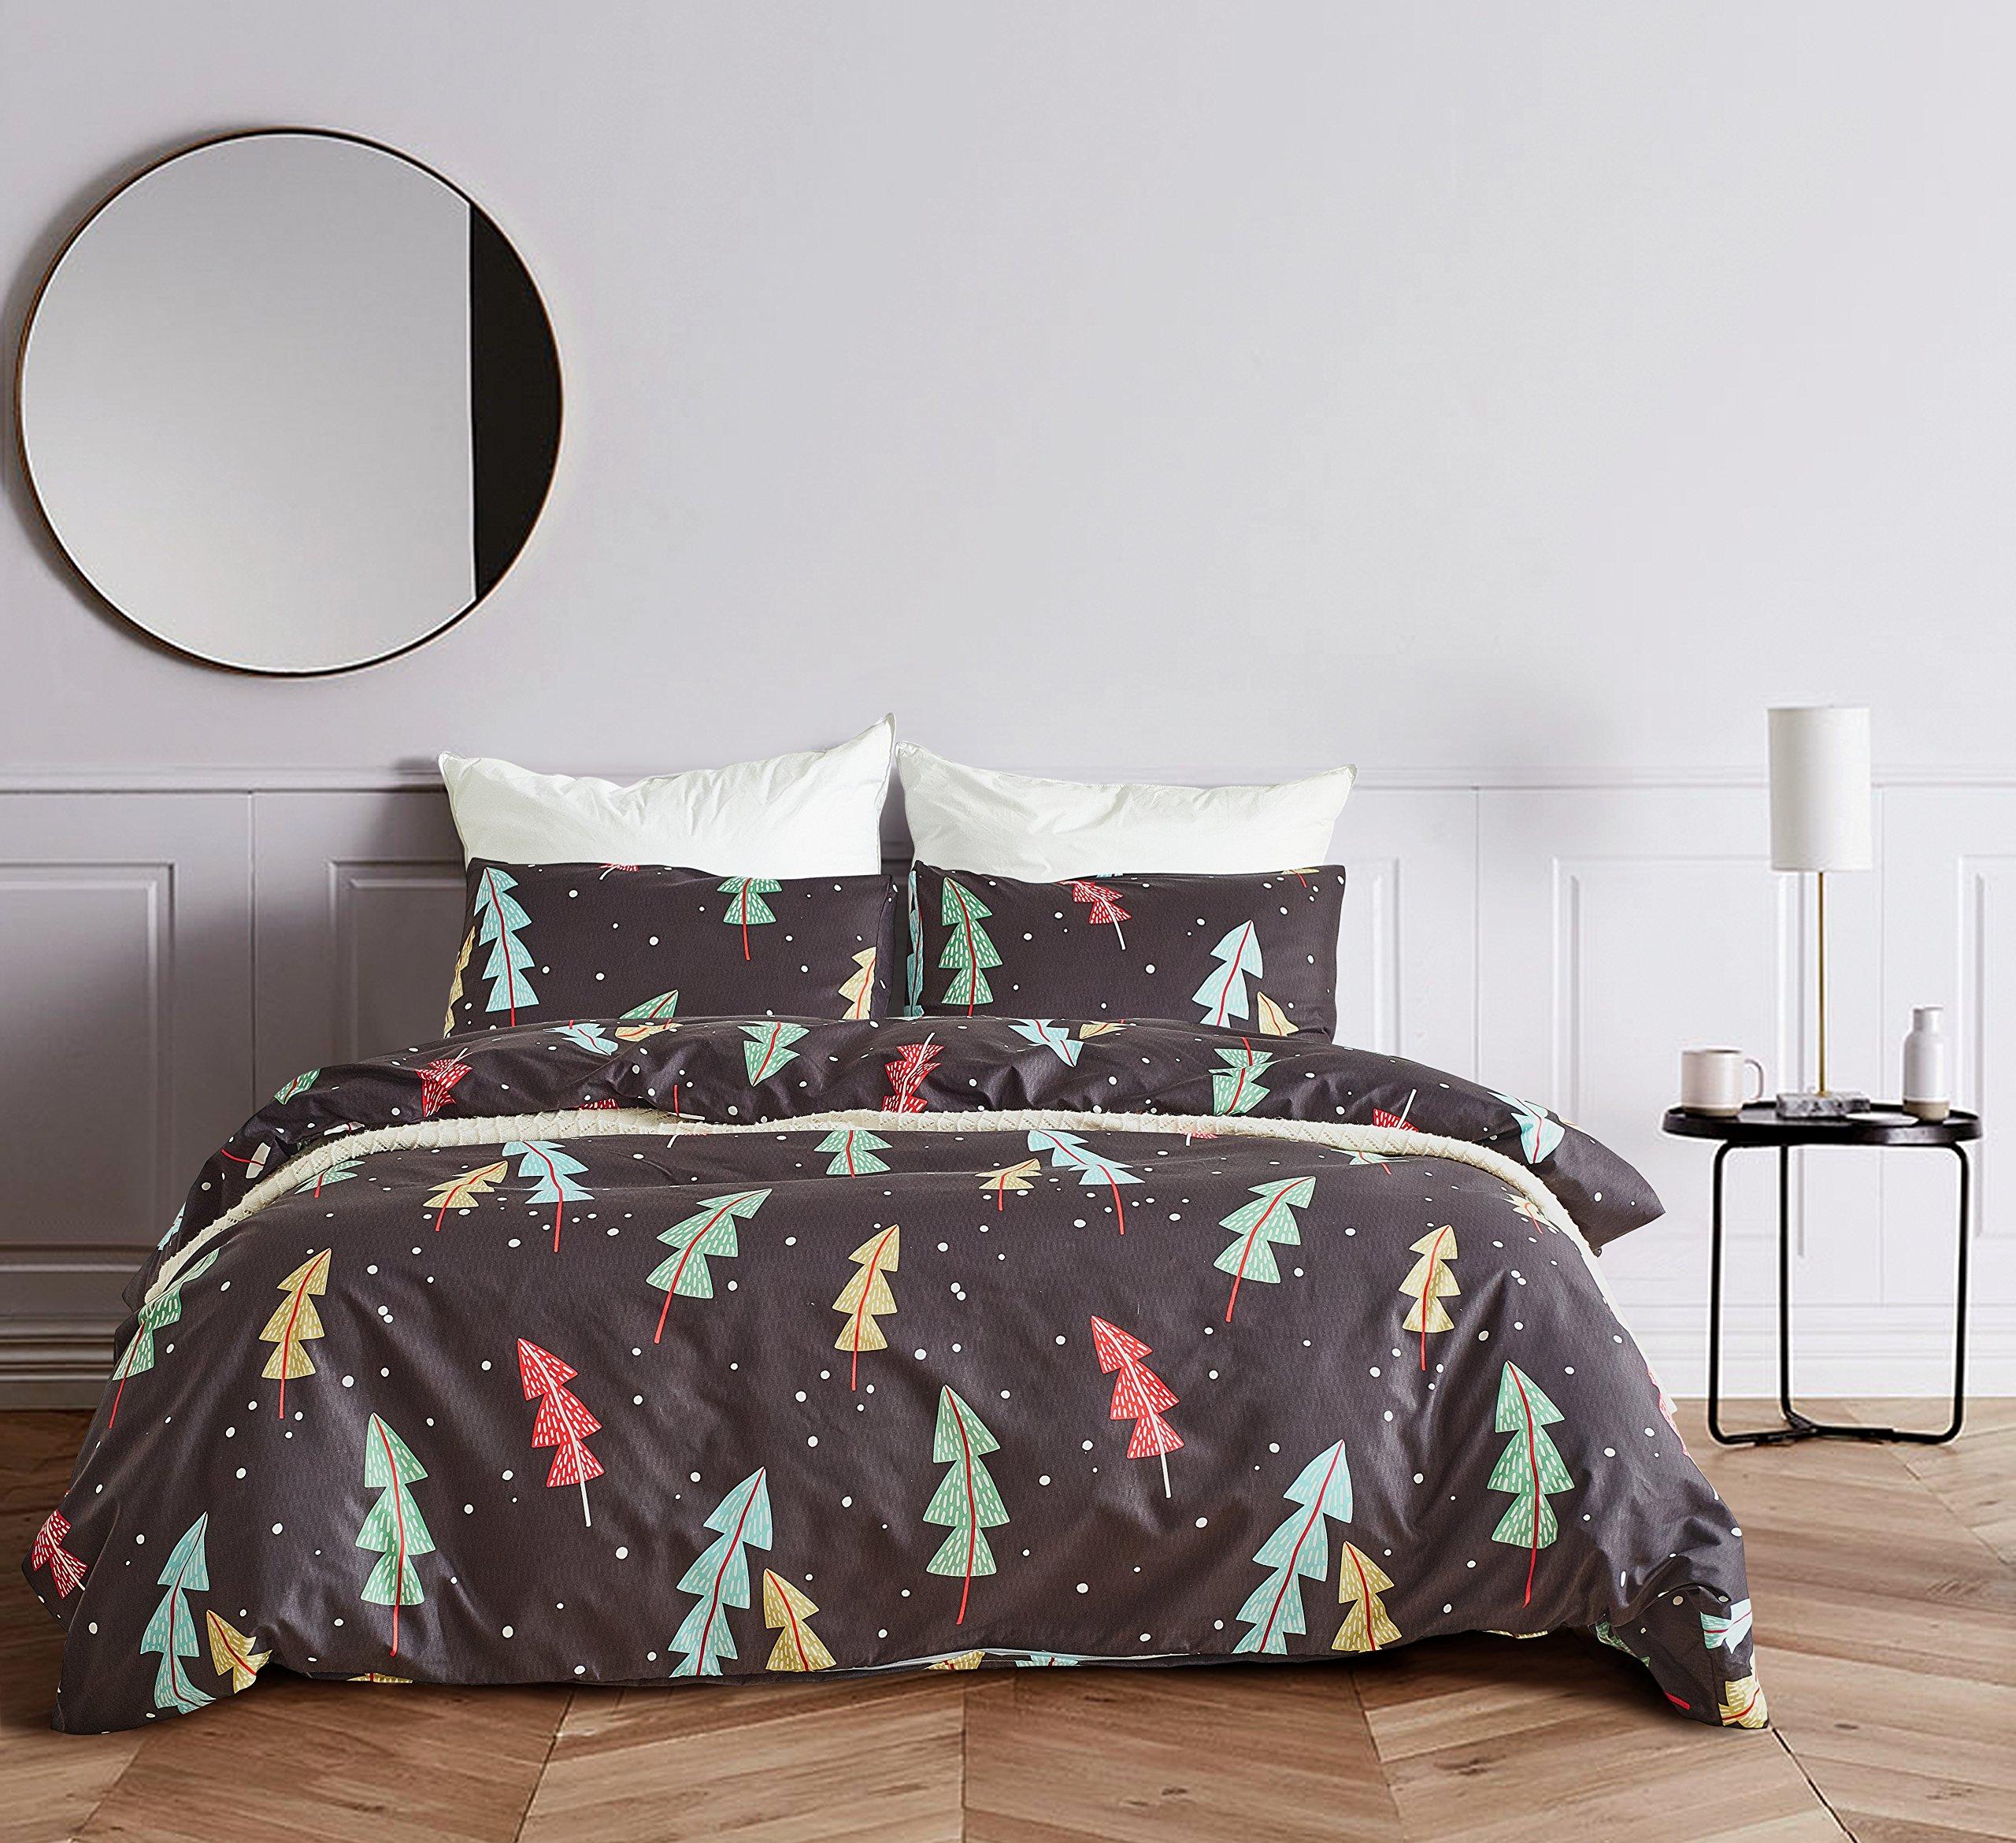 EIGOAL Duvet Cover Set Forest Printed Comforter Cover with Zipper Closure Kids Bedding Set Soft Lightweight Microfiber Twin/Queen/King Size